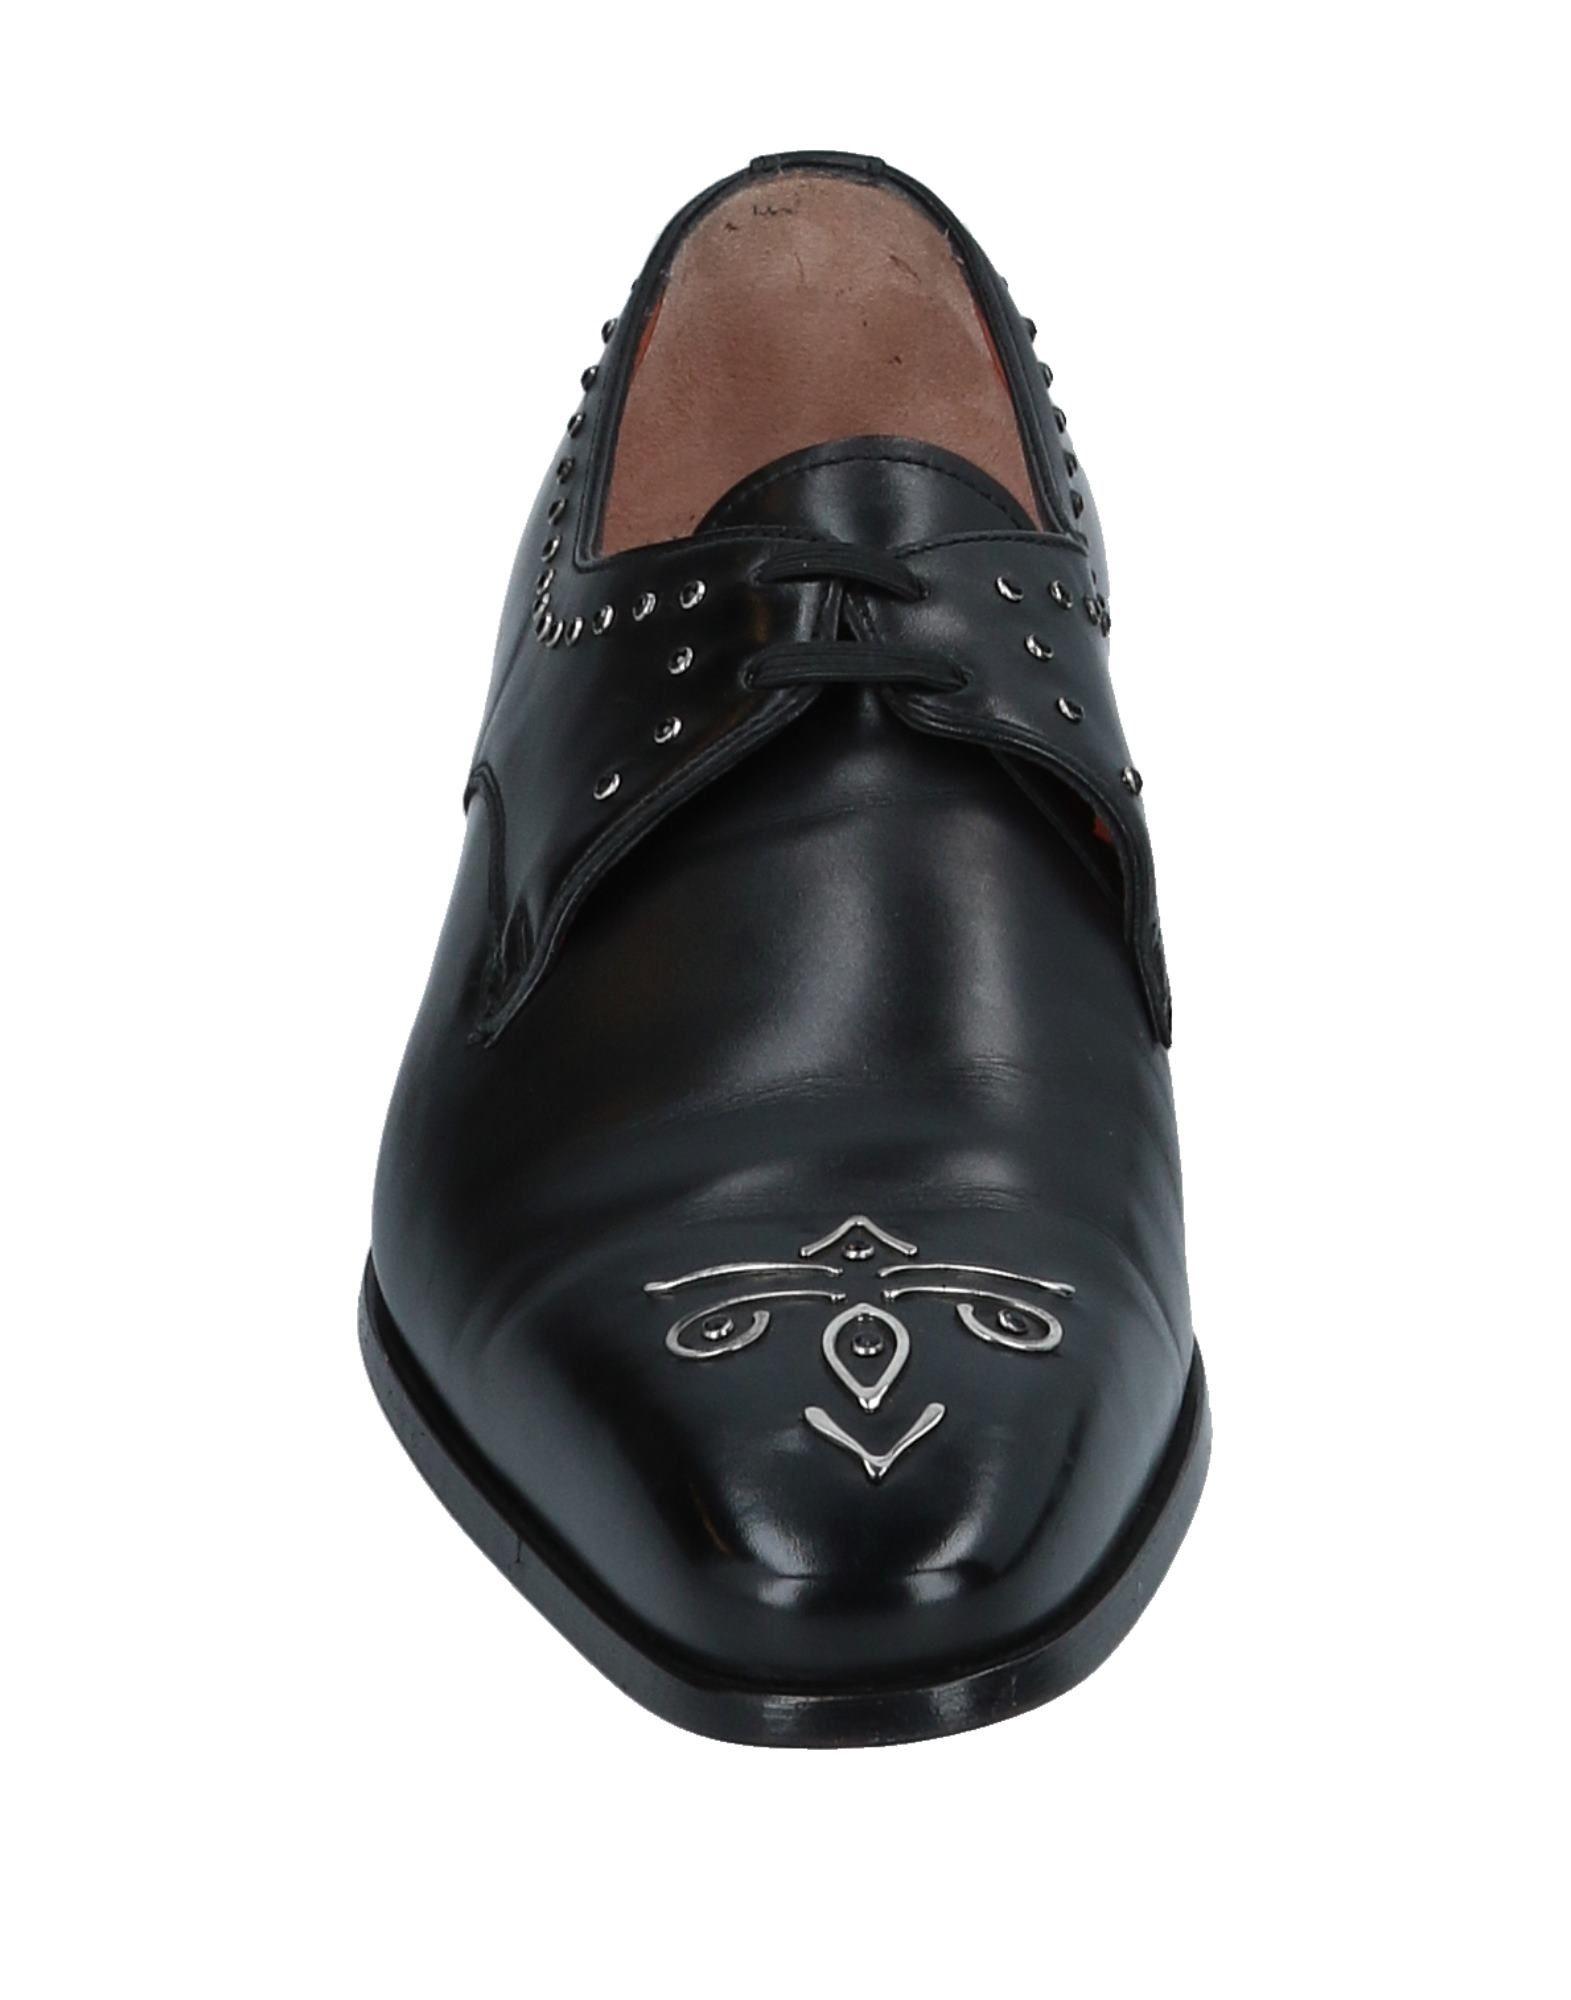 Santoni Schnürschuhe Gute Herren  11542513GT Gute Schnürschuhe Qualität beliebte Schuhe ecafbb